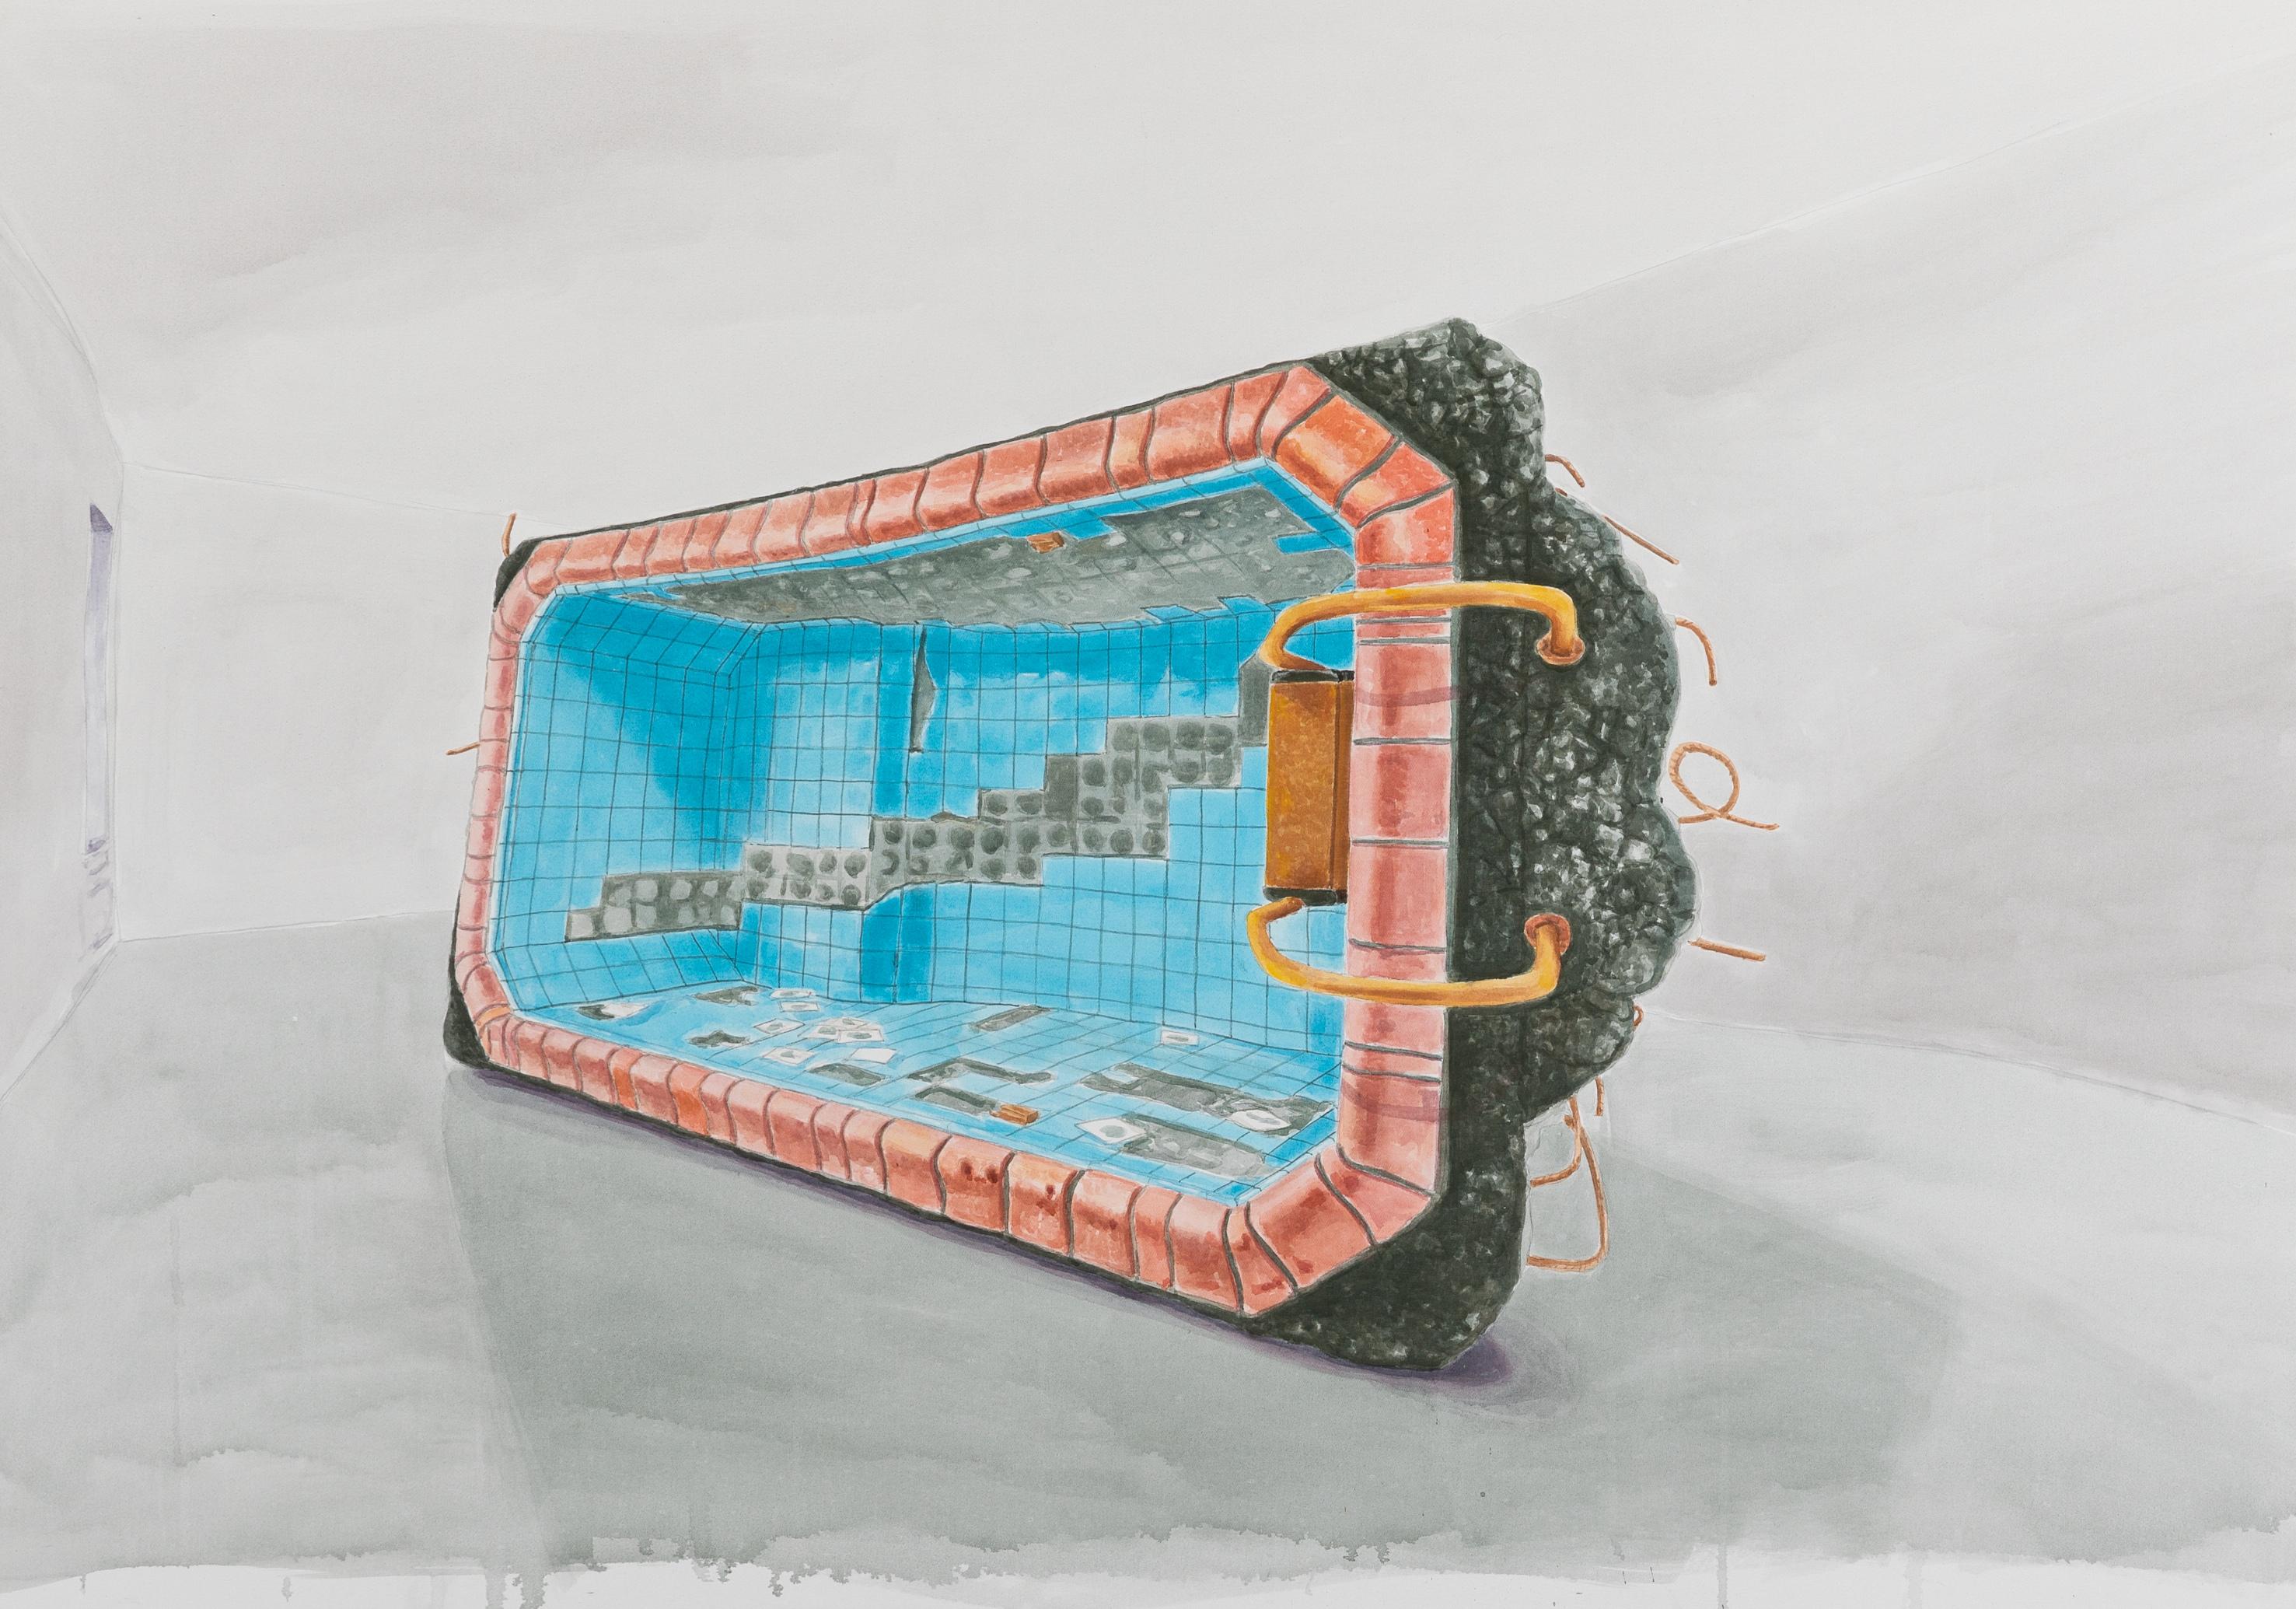 Microwave for one, 2018, Acrylic on canvas, 120 x 170 cm